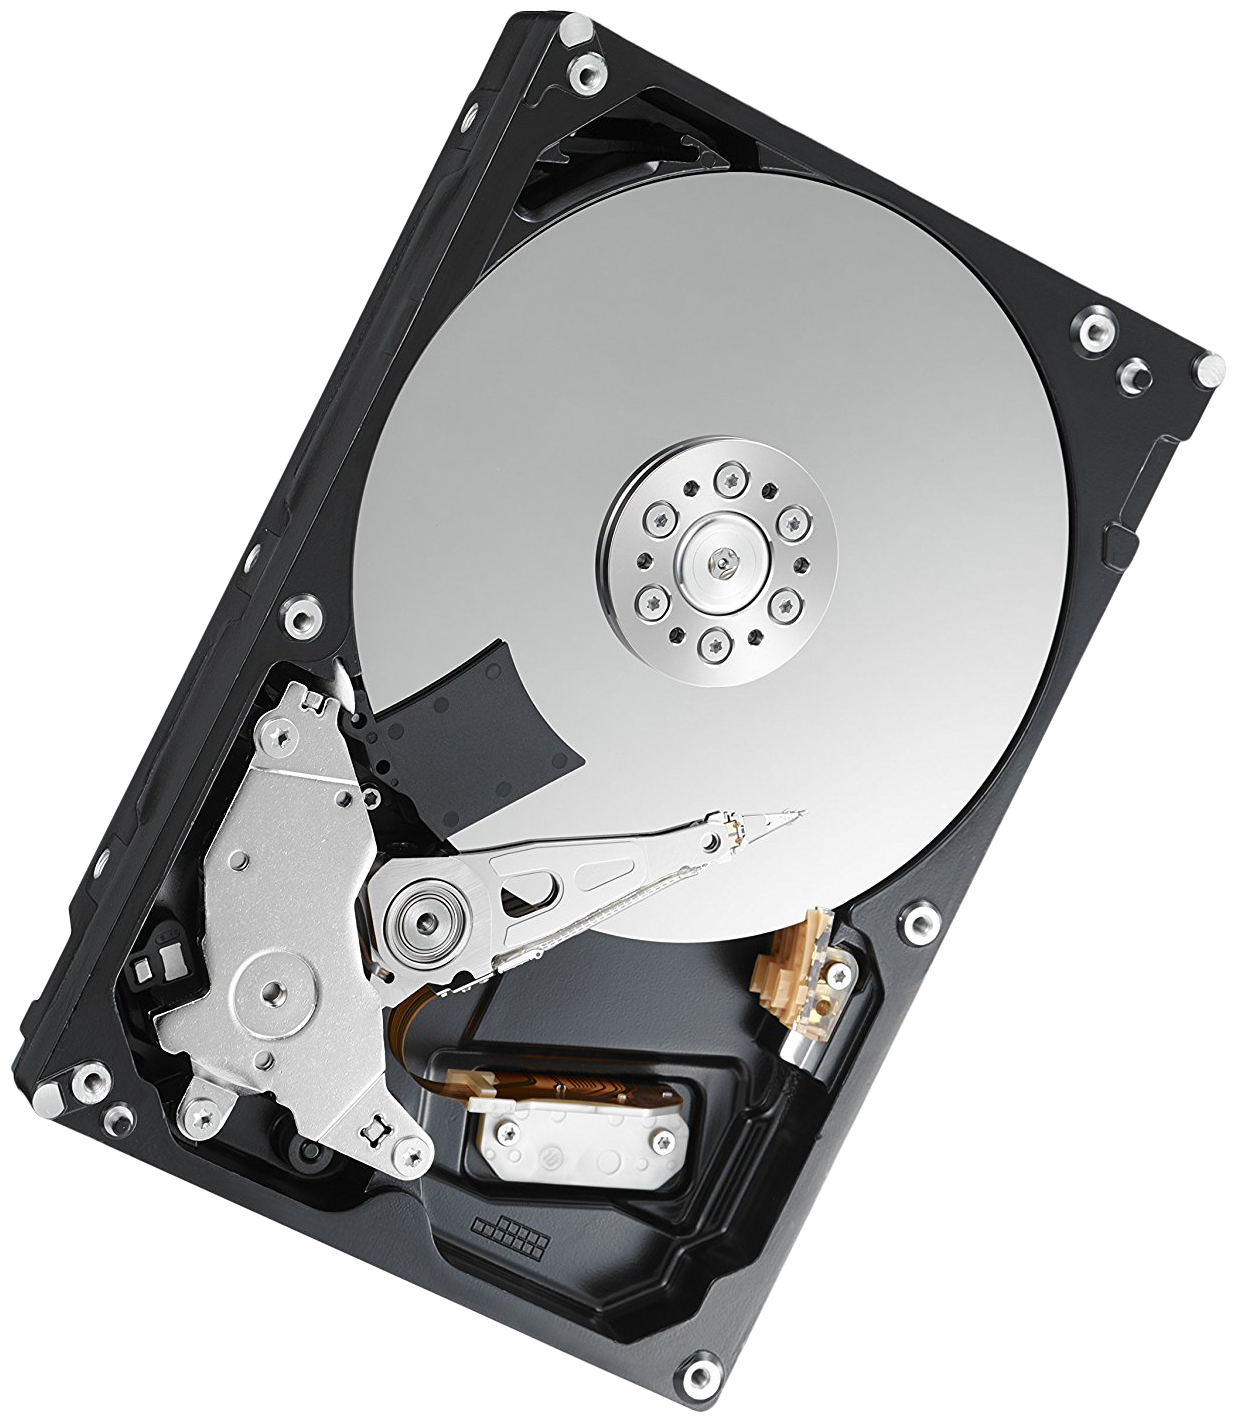 Внутренний жесткий диск Toshiba E300 3TB (HDWA130UZSVA)